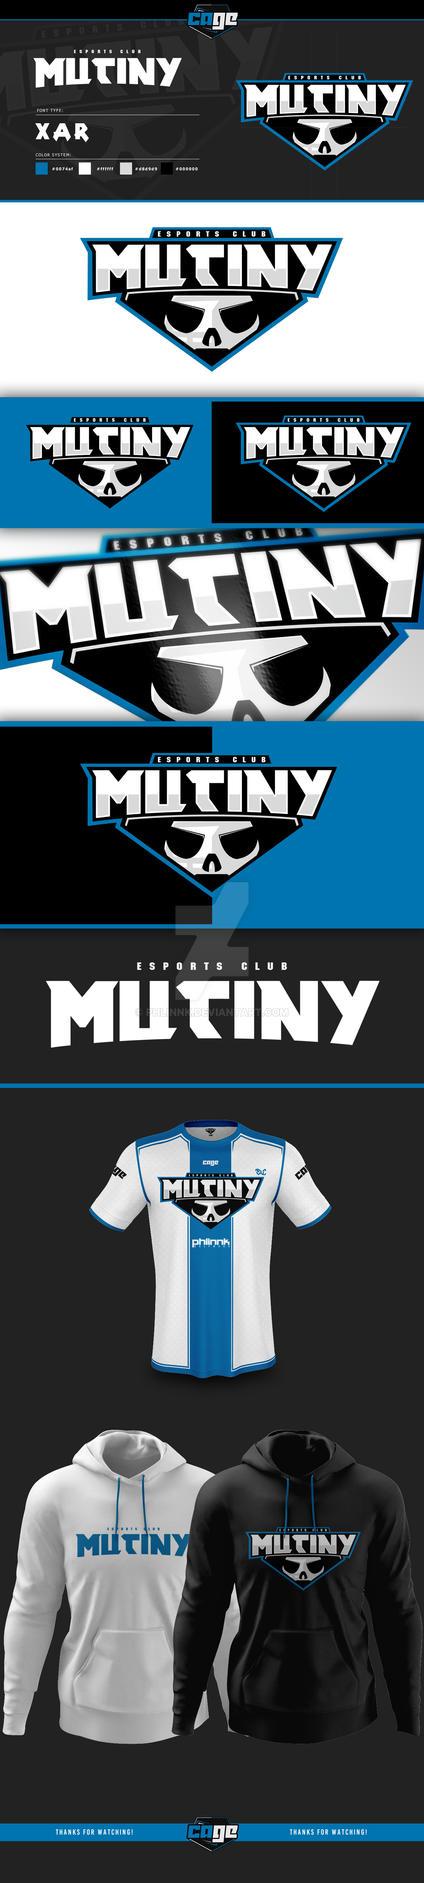 eSports Club Mutiny Logo Project by PHLiNNk